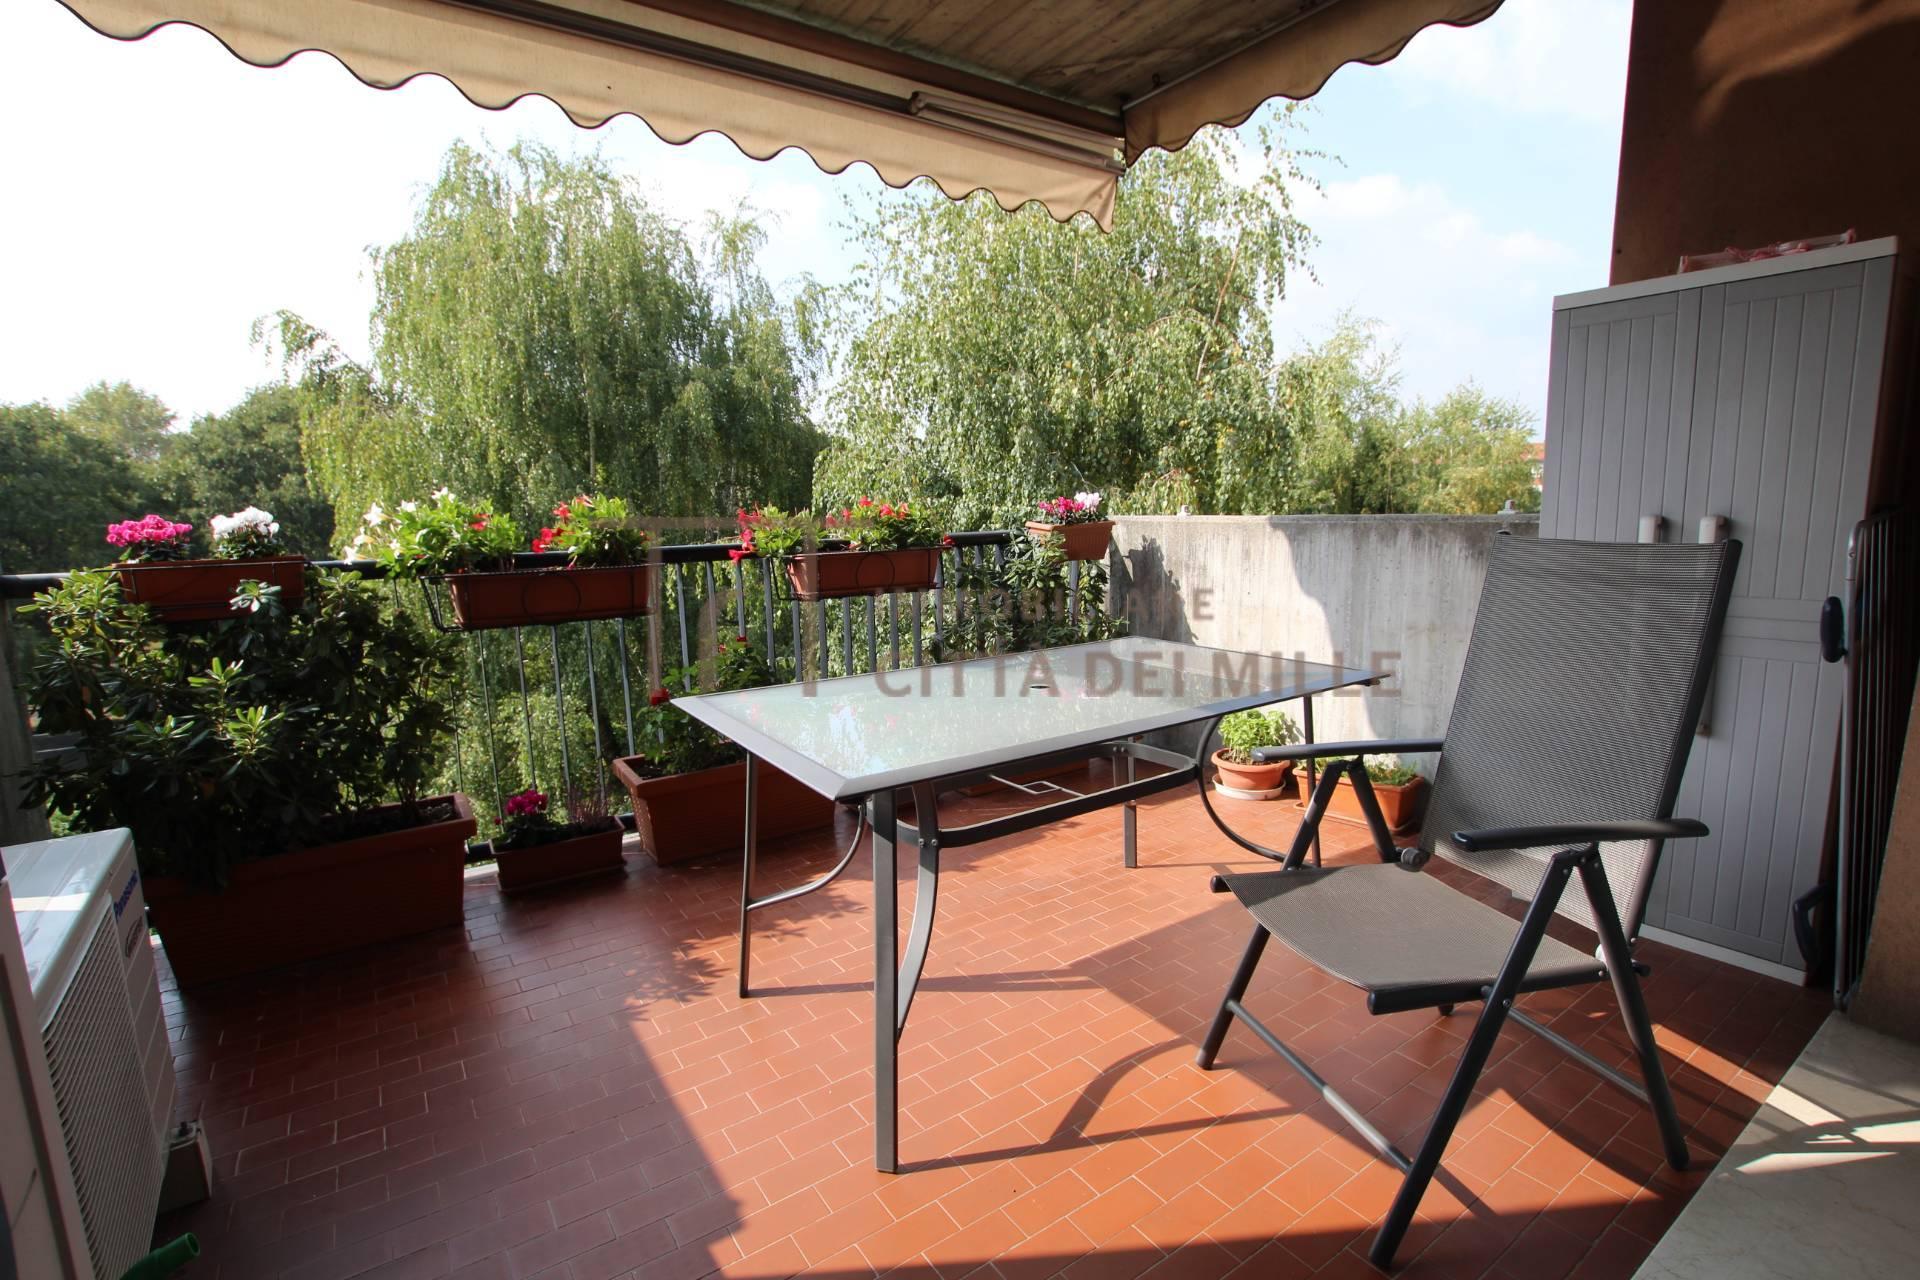 Appartamento in vendita Campagnola-Via Pacino Da Nova Bergamo